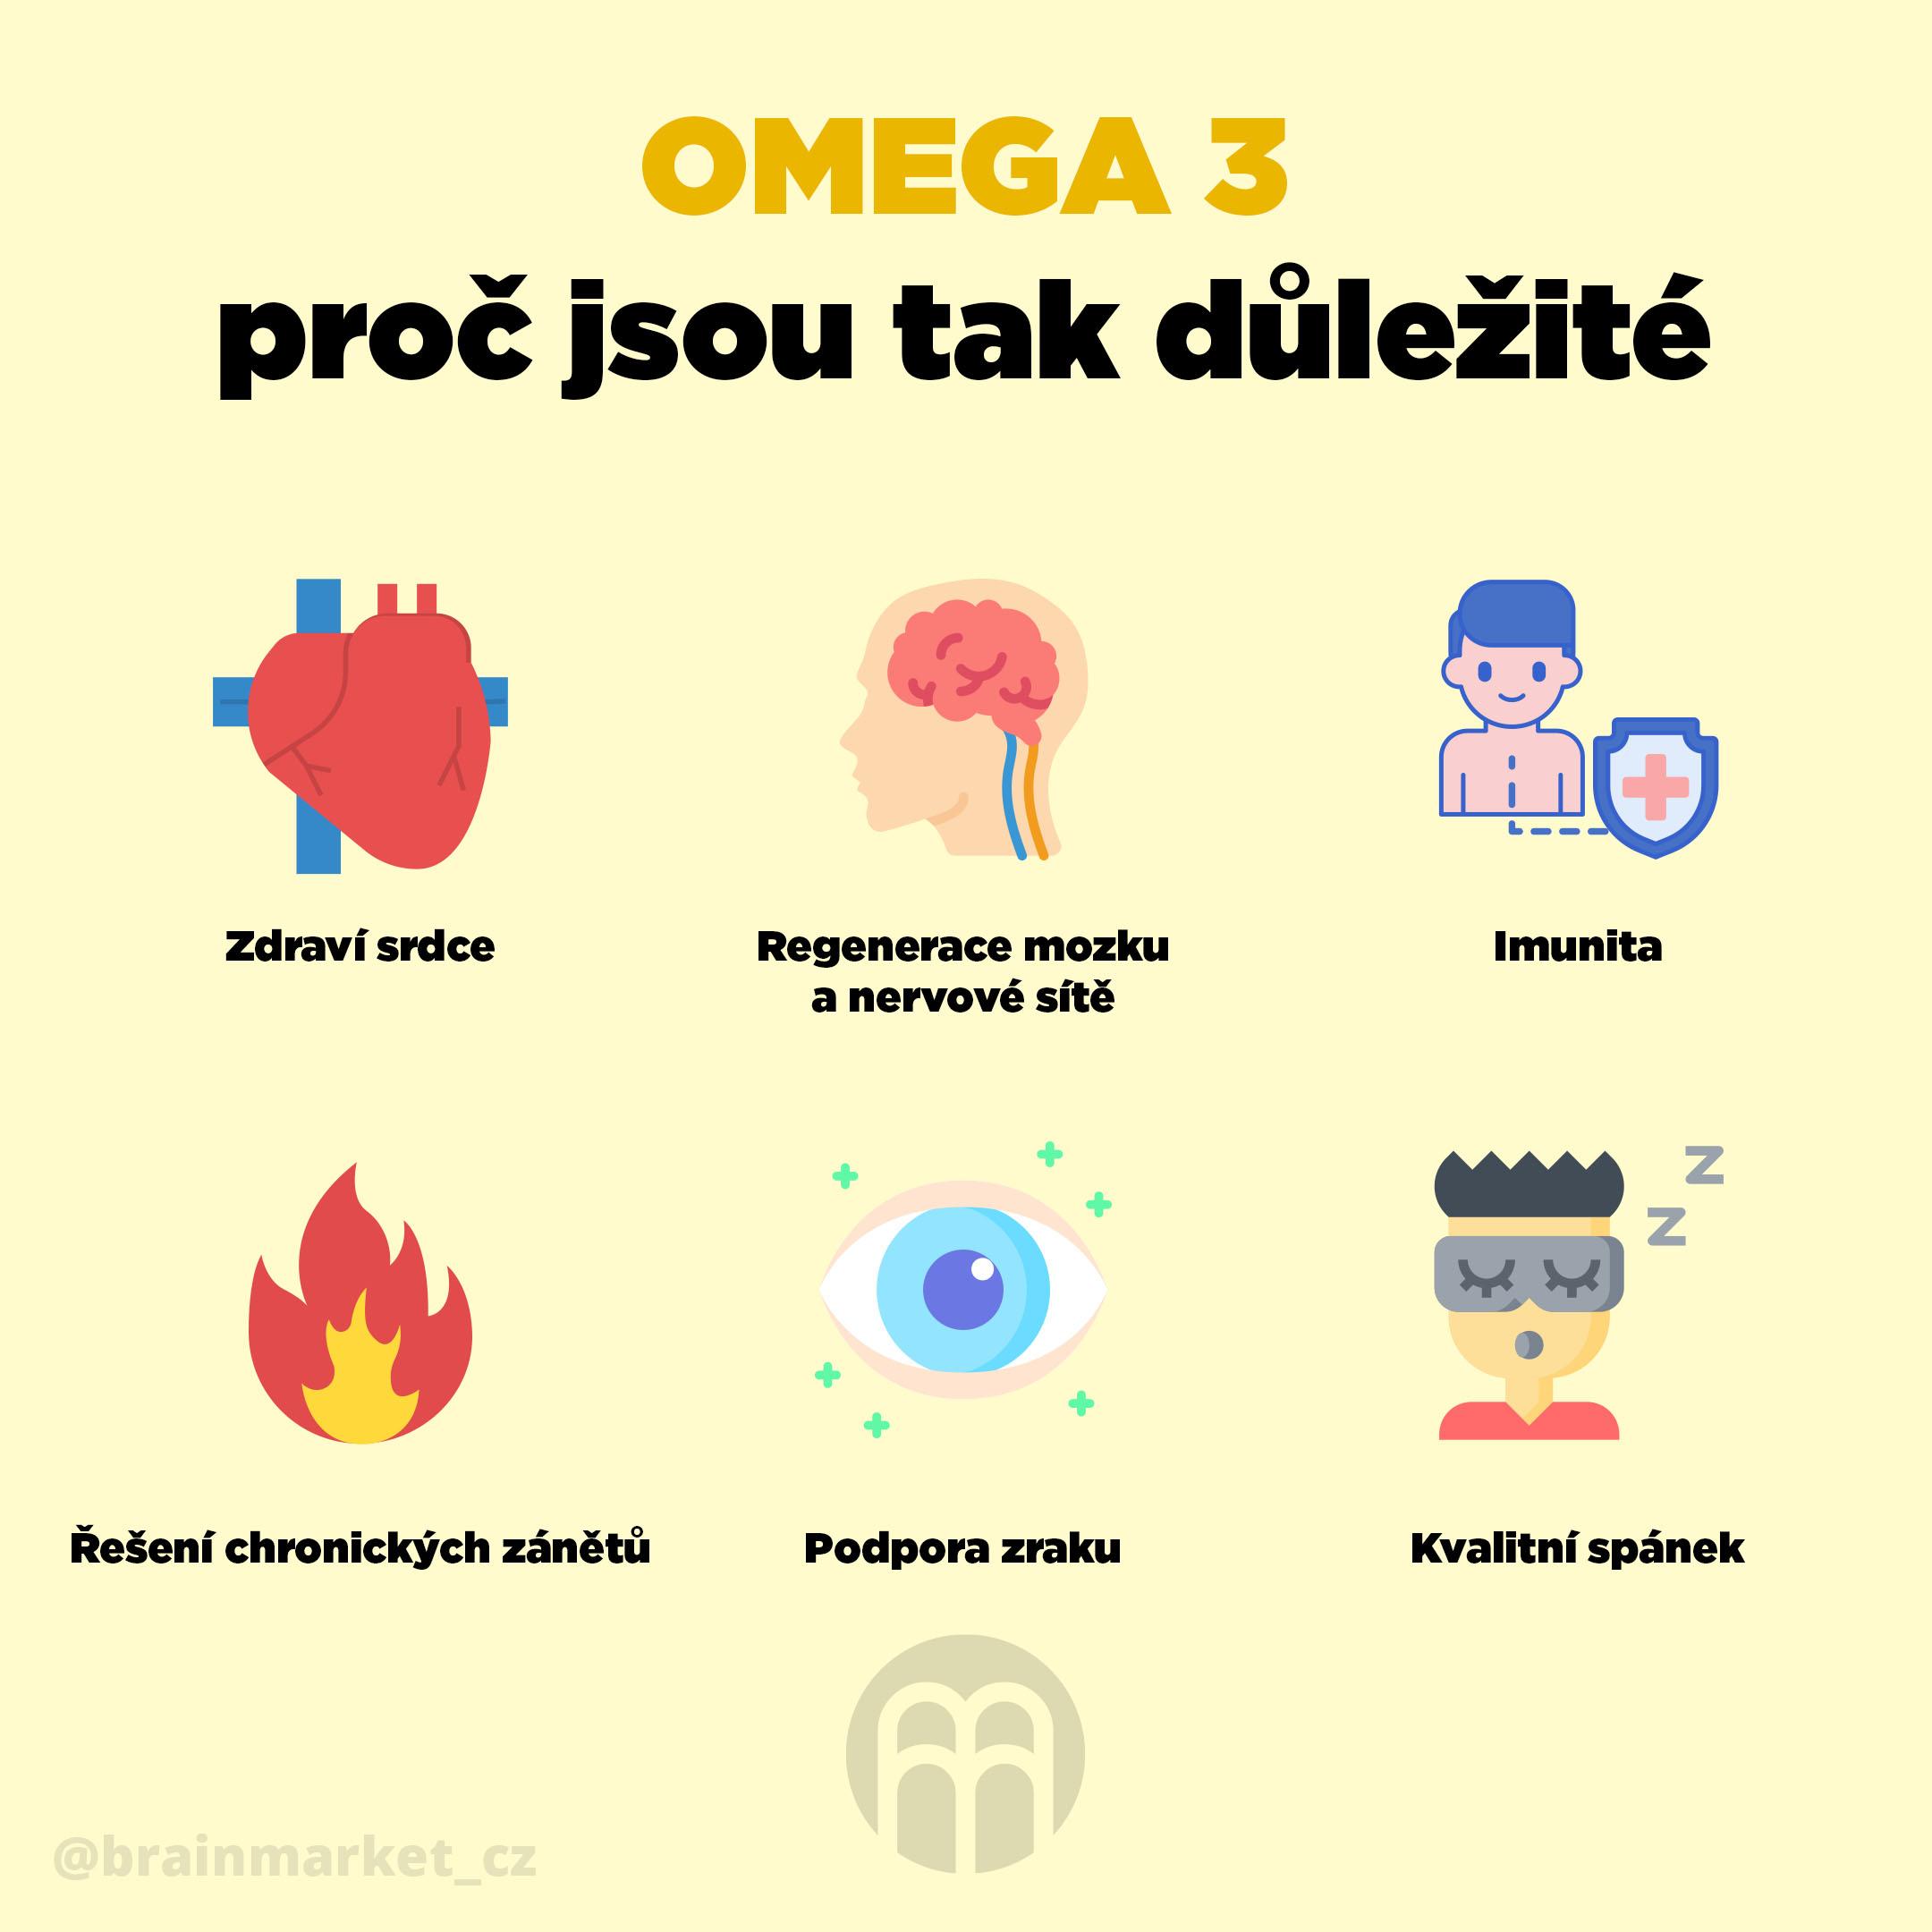 omega-3-proc-jsou-tak-dulezite-infografika-brainmarket-cz